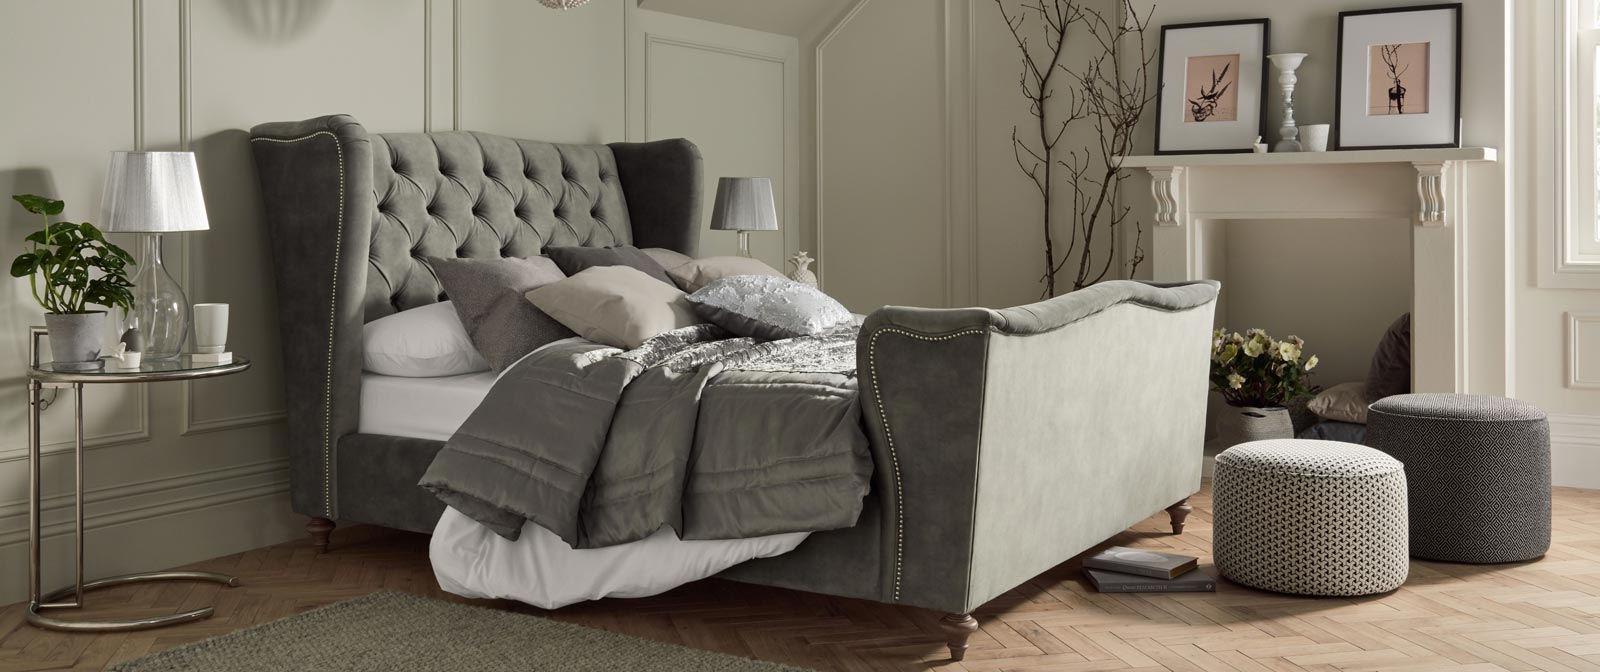 Cool Hoggs Furniture Newry Bedroom Furniture Creativecarmelina Interior Chair Design Creativecarmelinacom